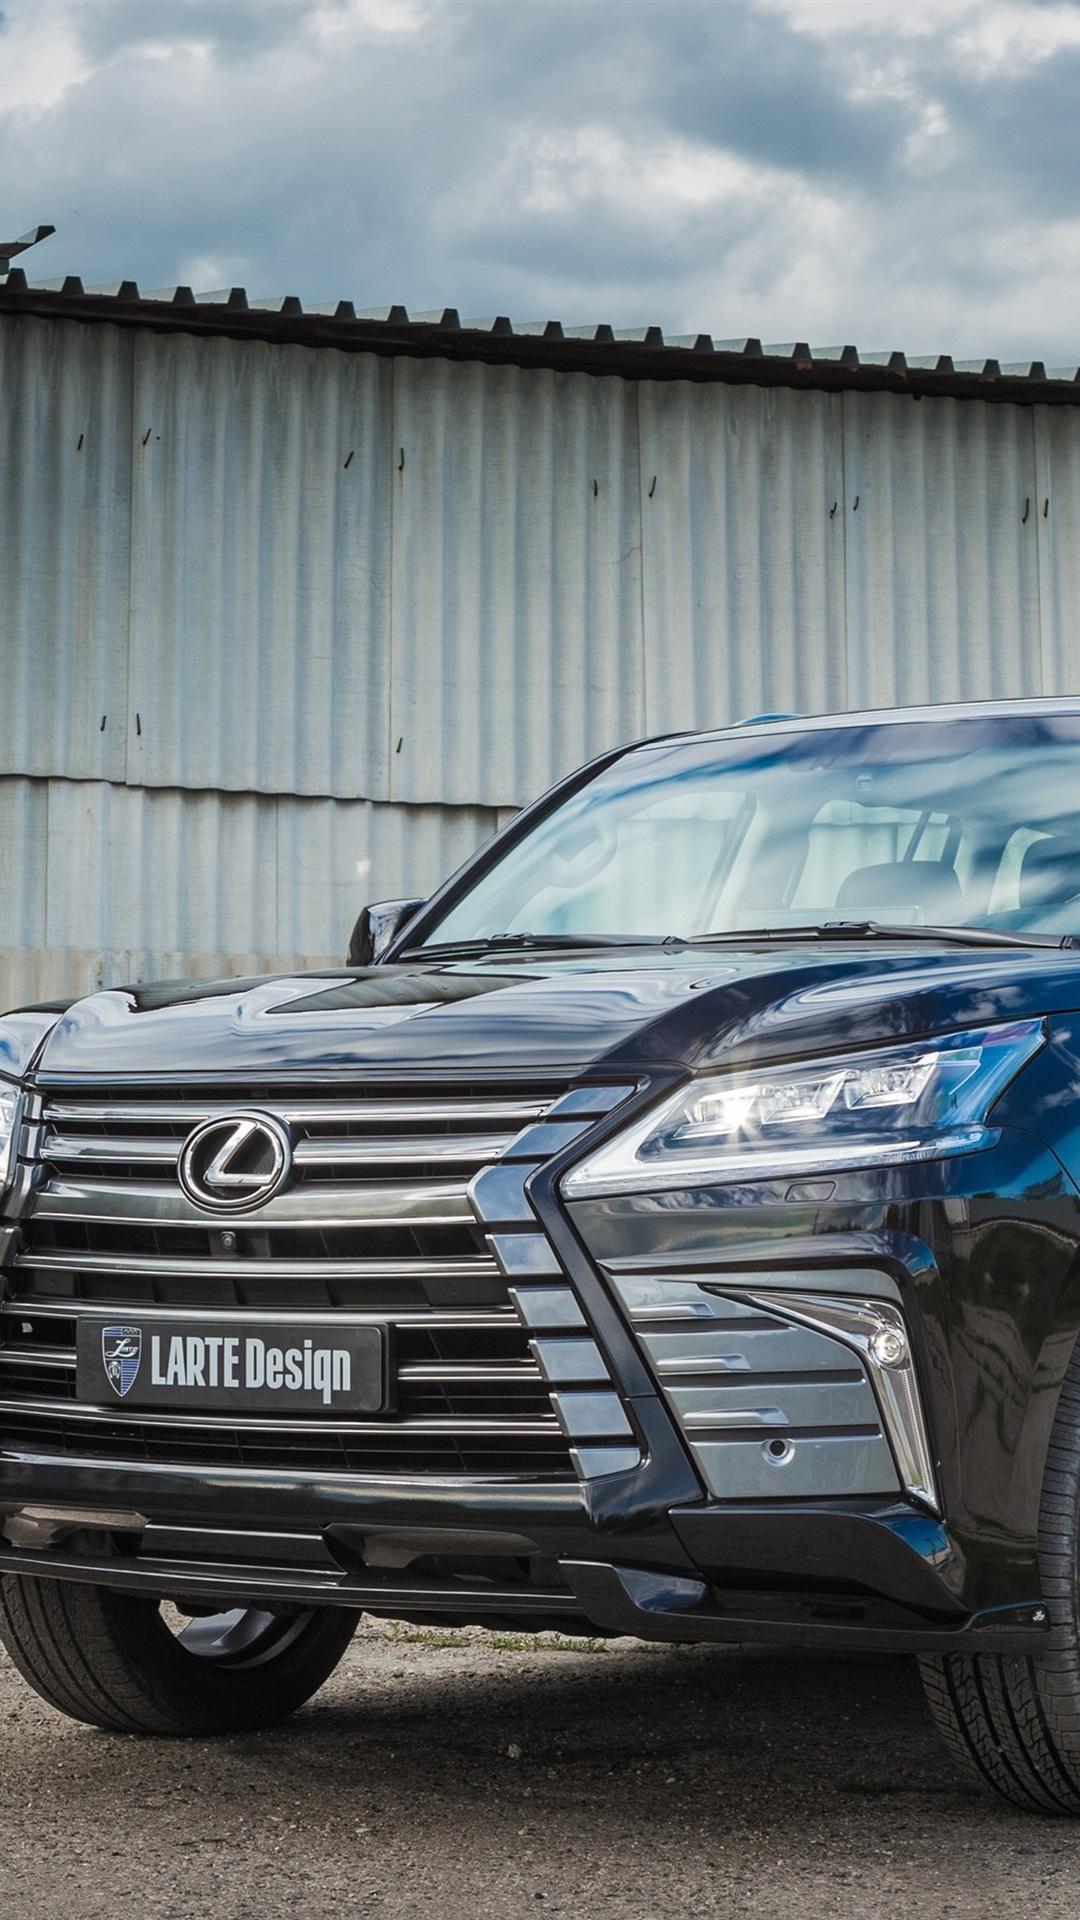 Lexus Lx 570 Black Suv Car 1080x1920 Iphone 8 7 6 6s Plus